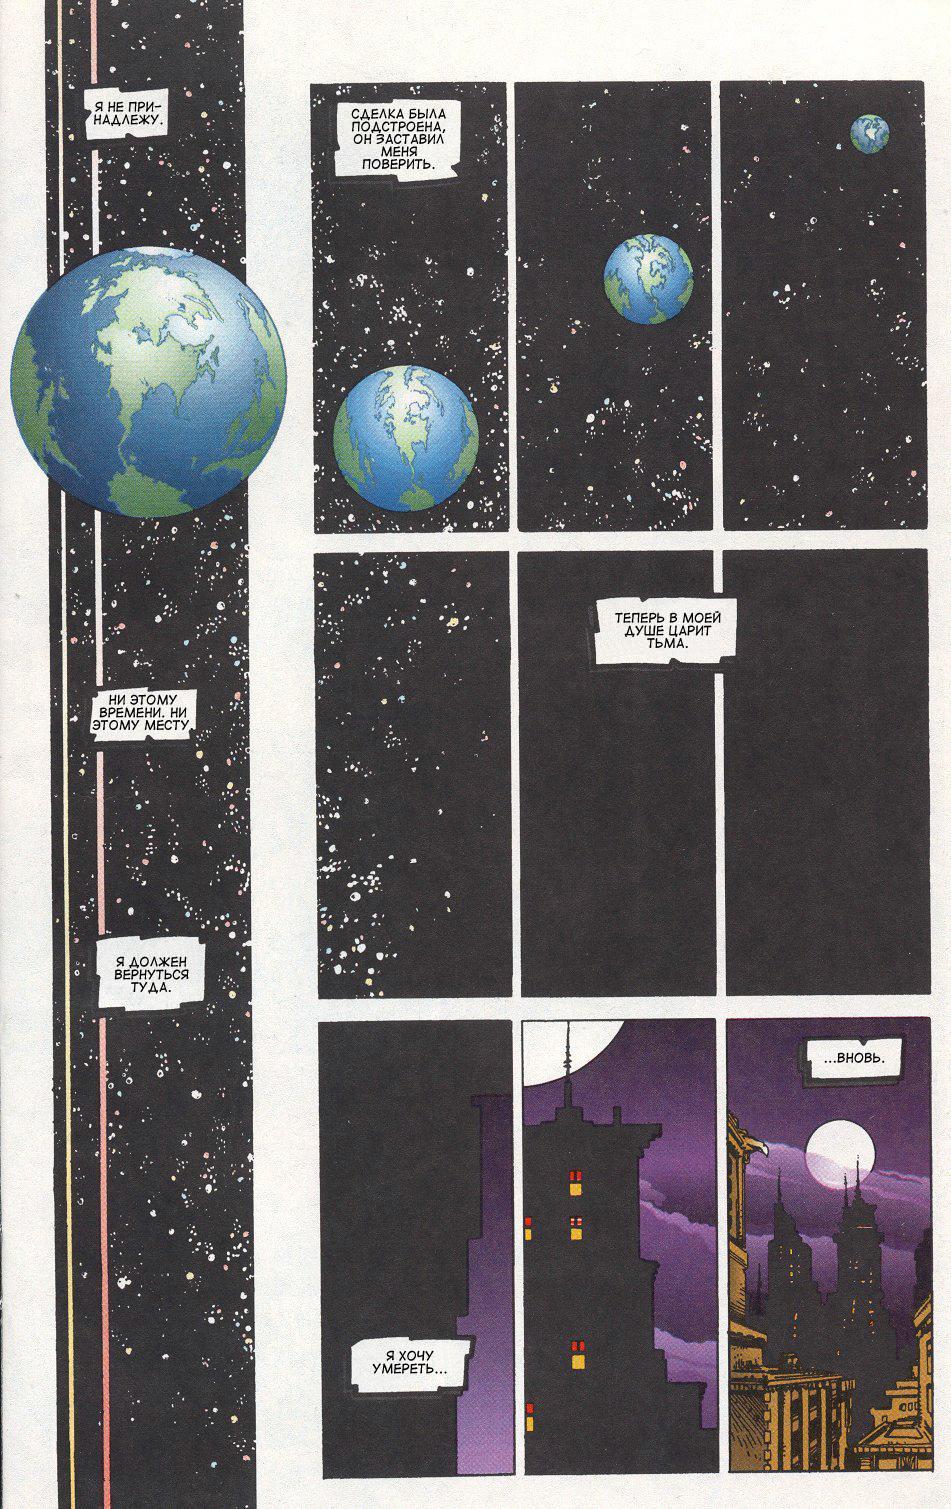 читать комикс тьма